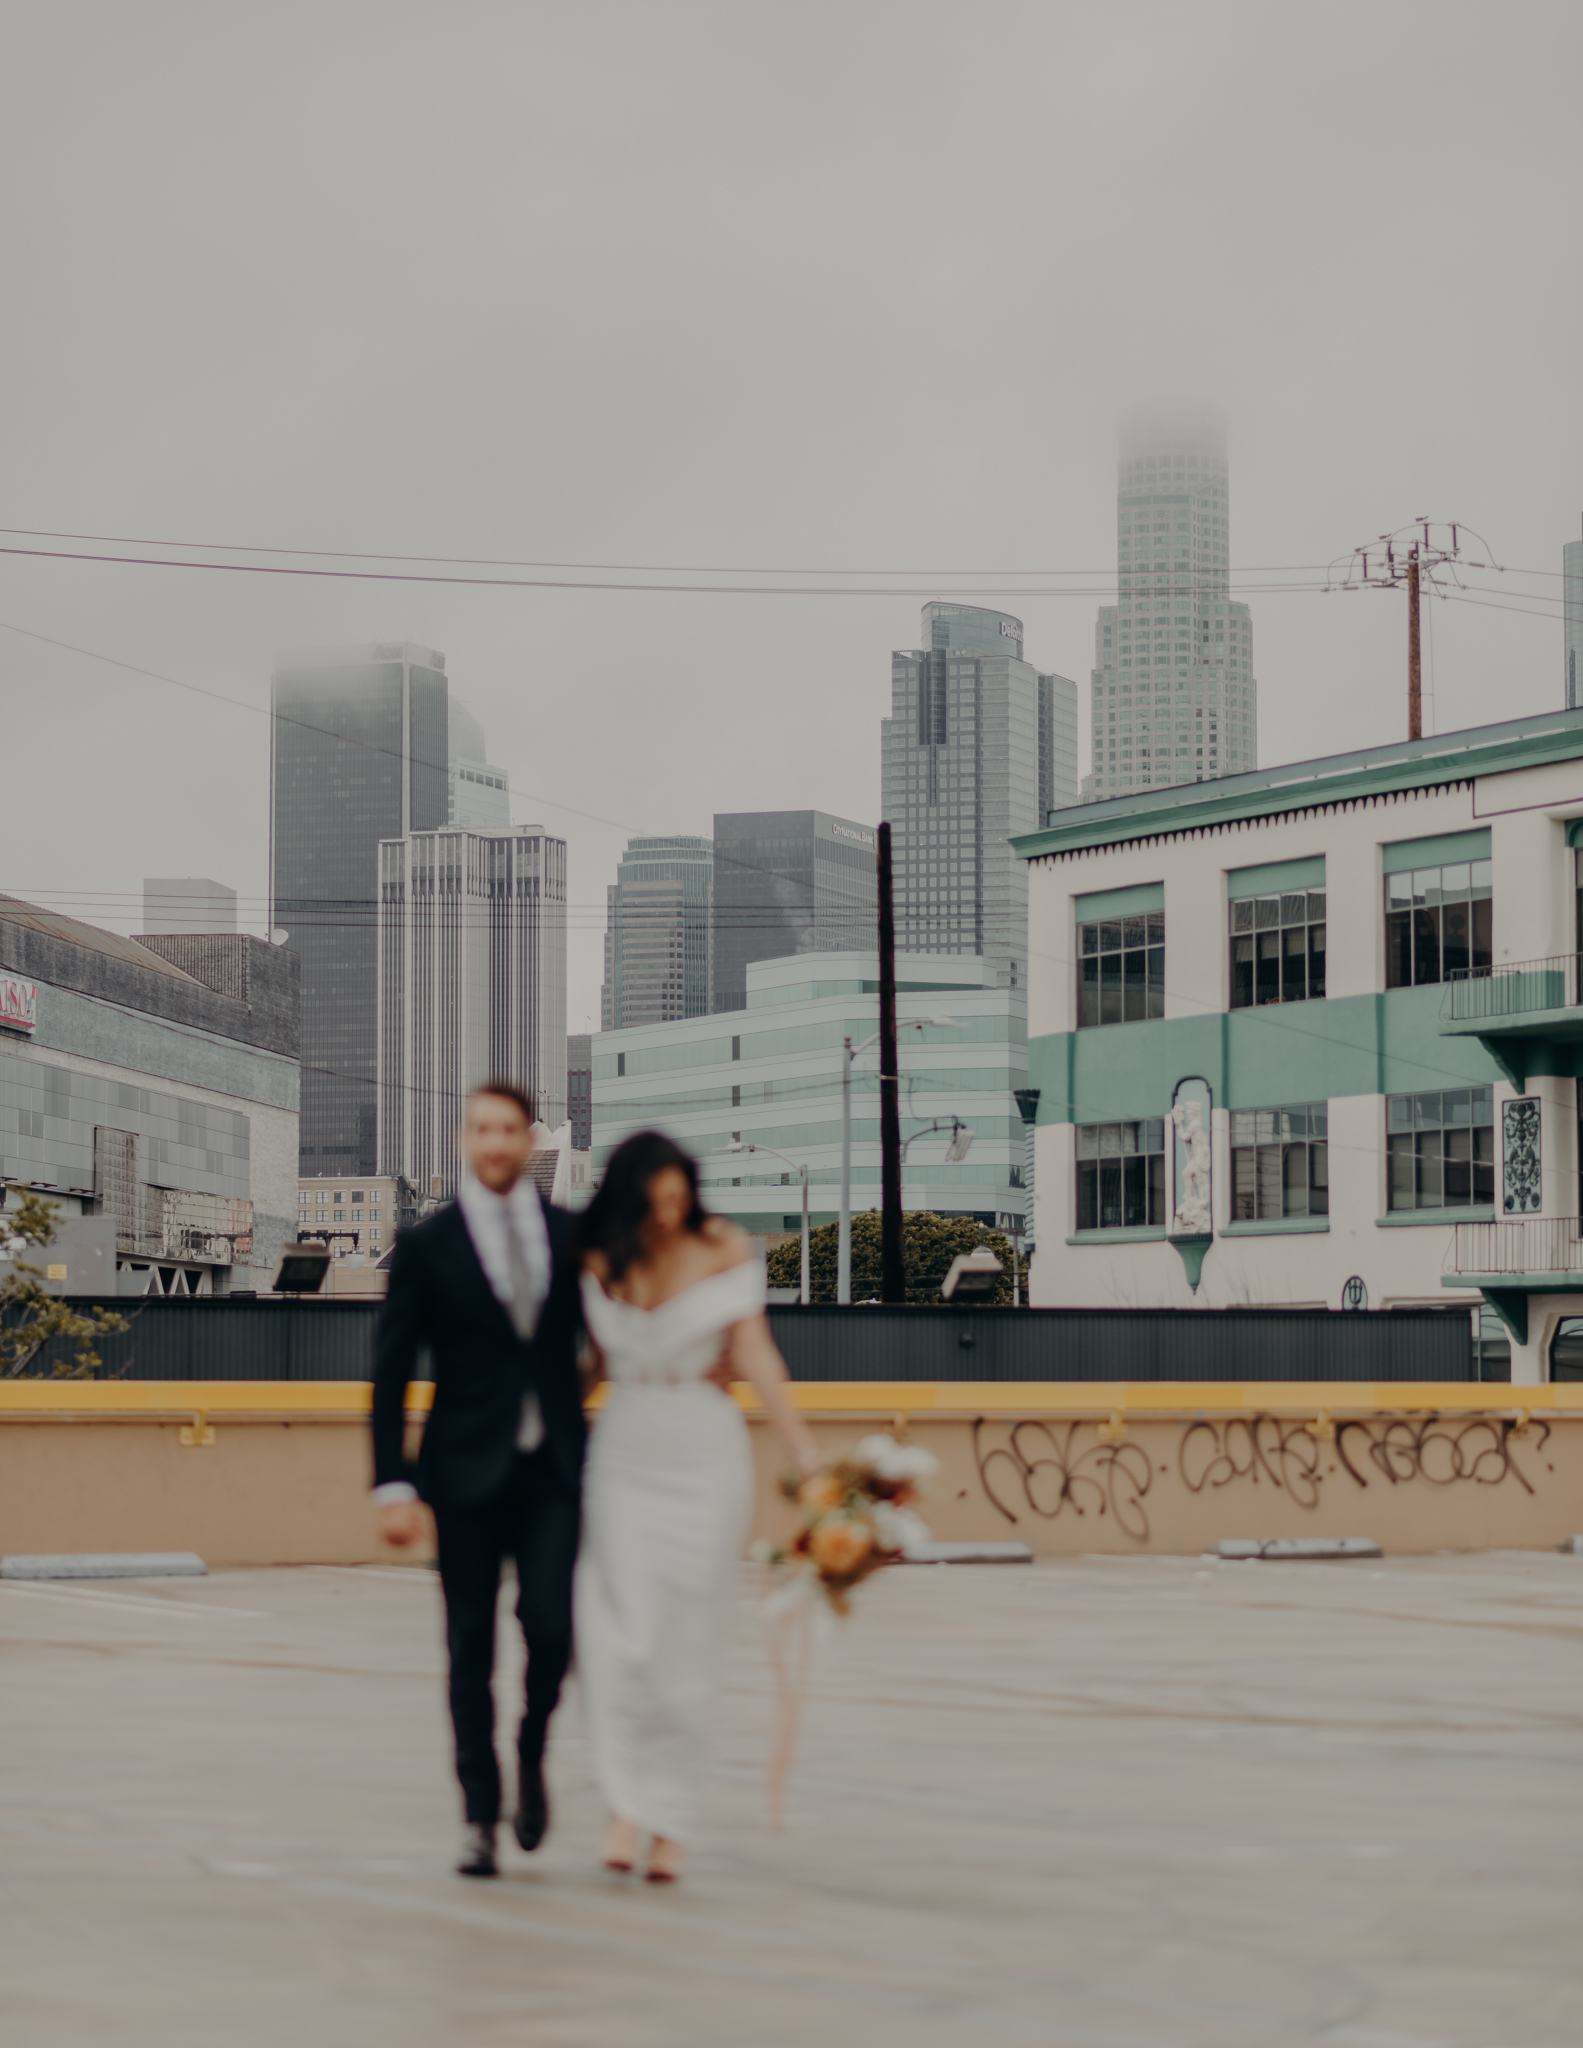 Wedding Photo LA - wedding photographer in los angeles - millwick wedding venue -isaiahandtaylor.com-075.jpg